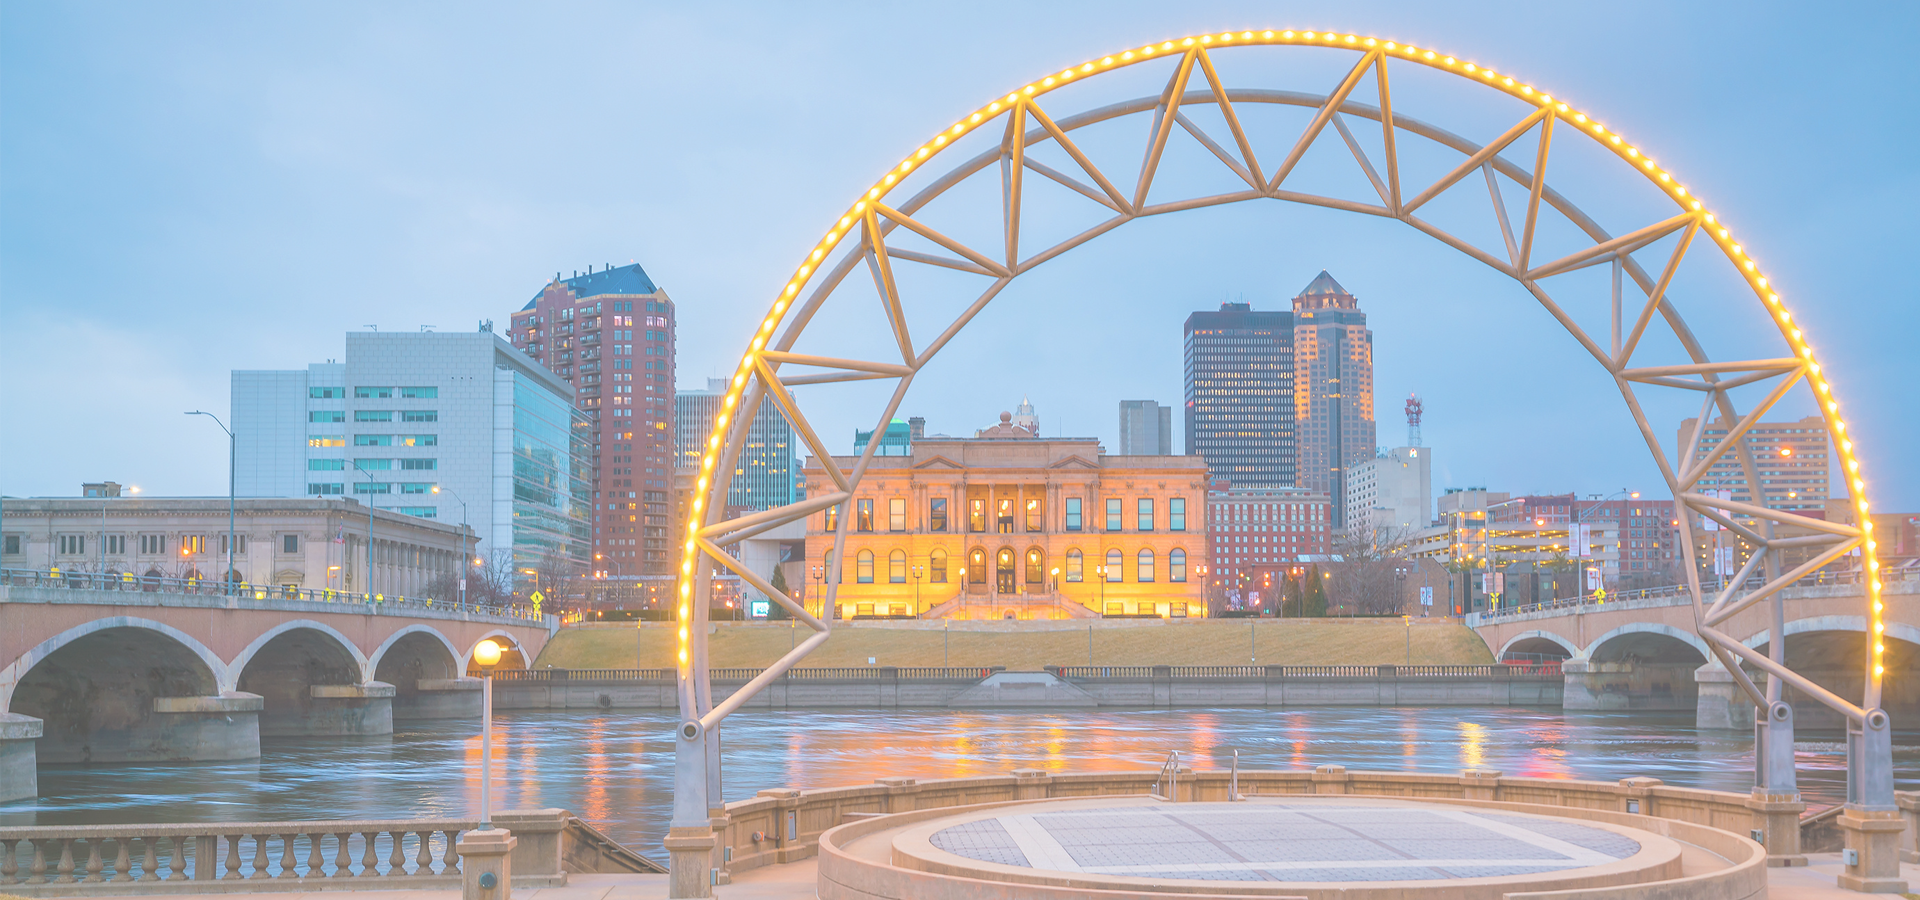 Peer-to-peer advisory in Des Moines, Iowa, USA